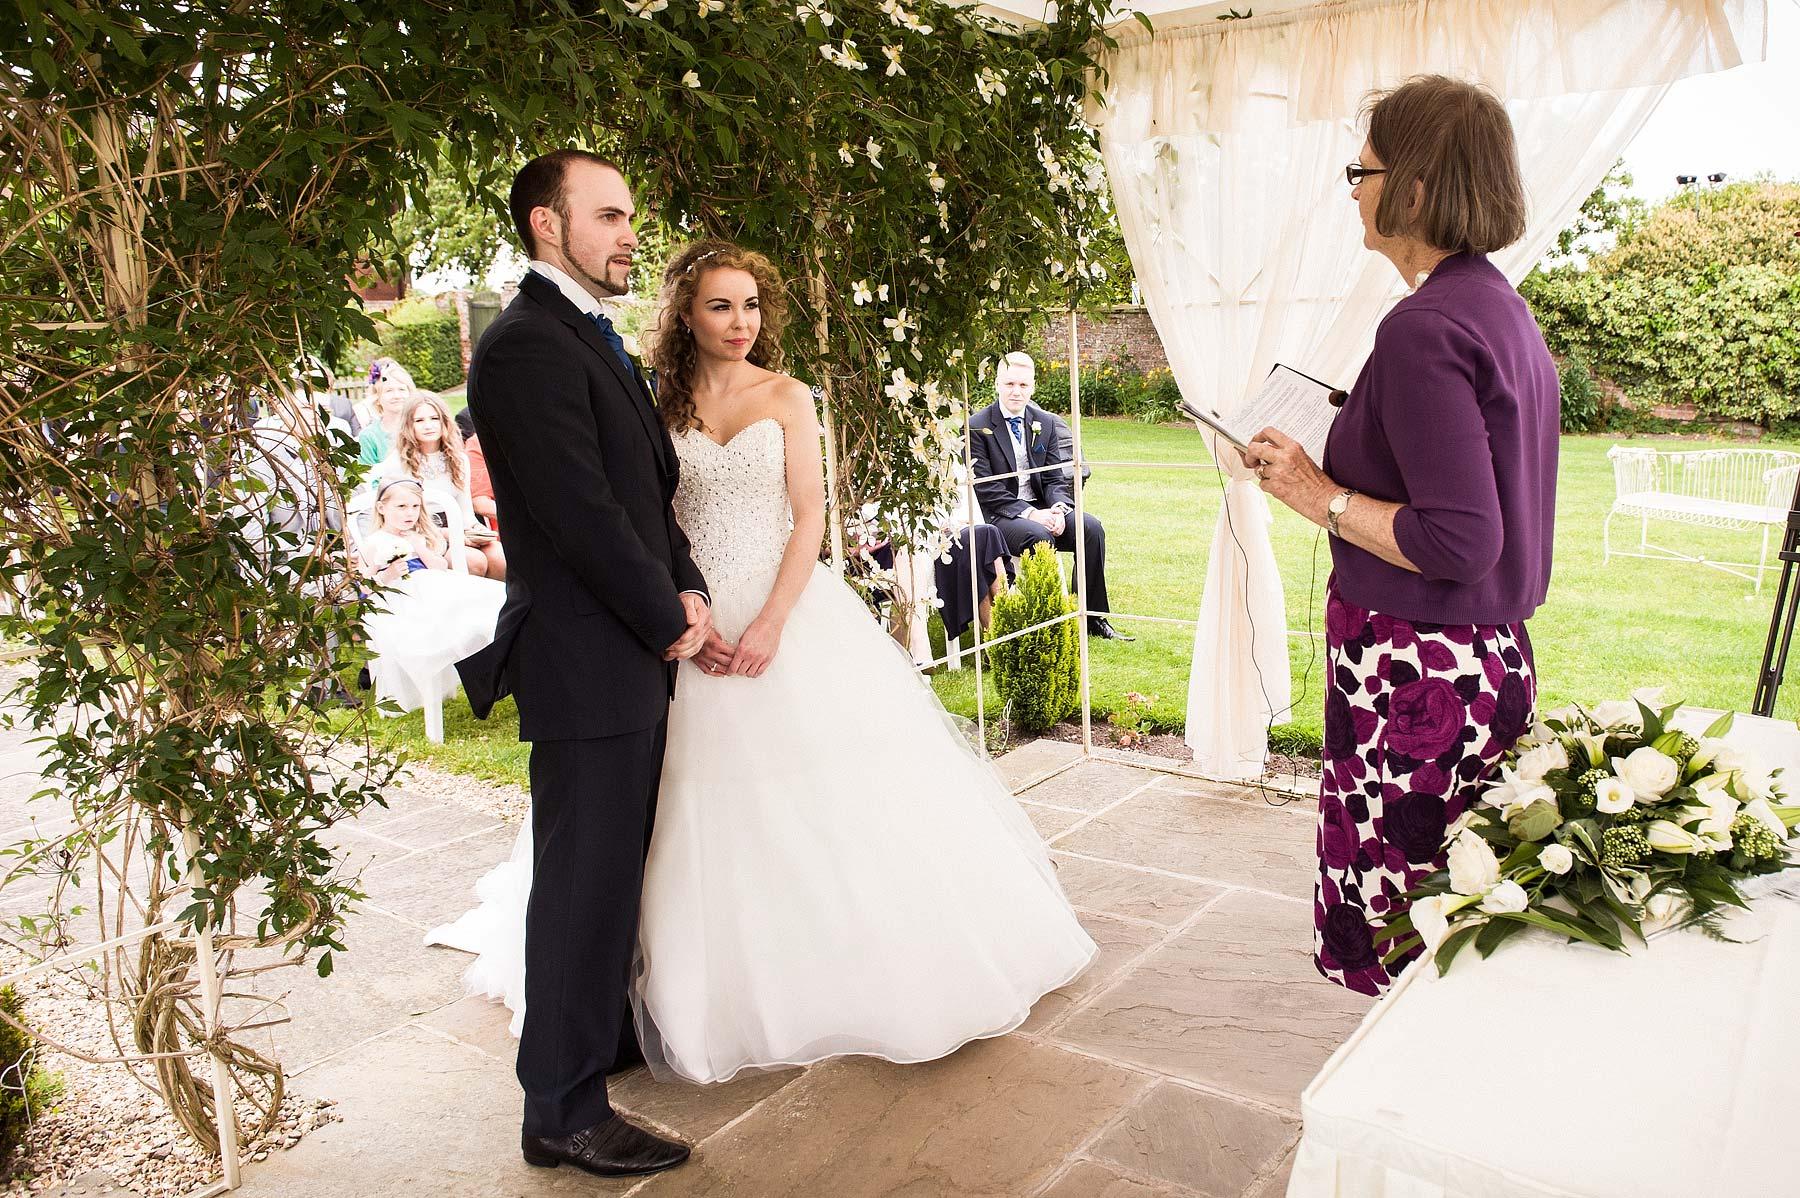 albright-hussey-manor-wedding-photographers-025